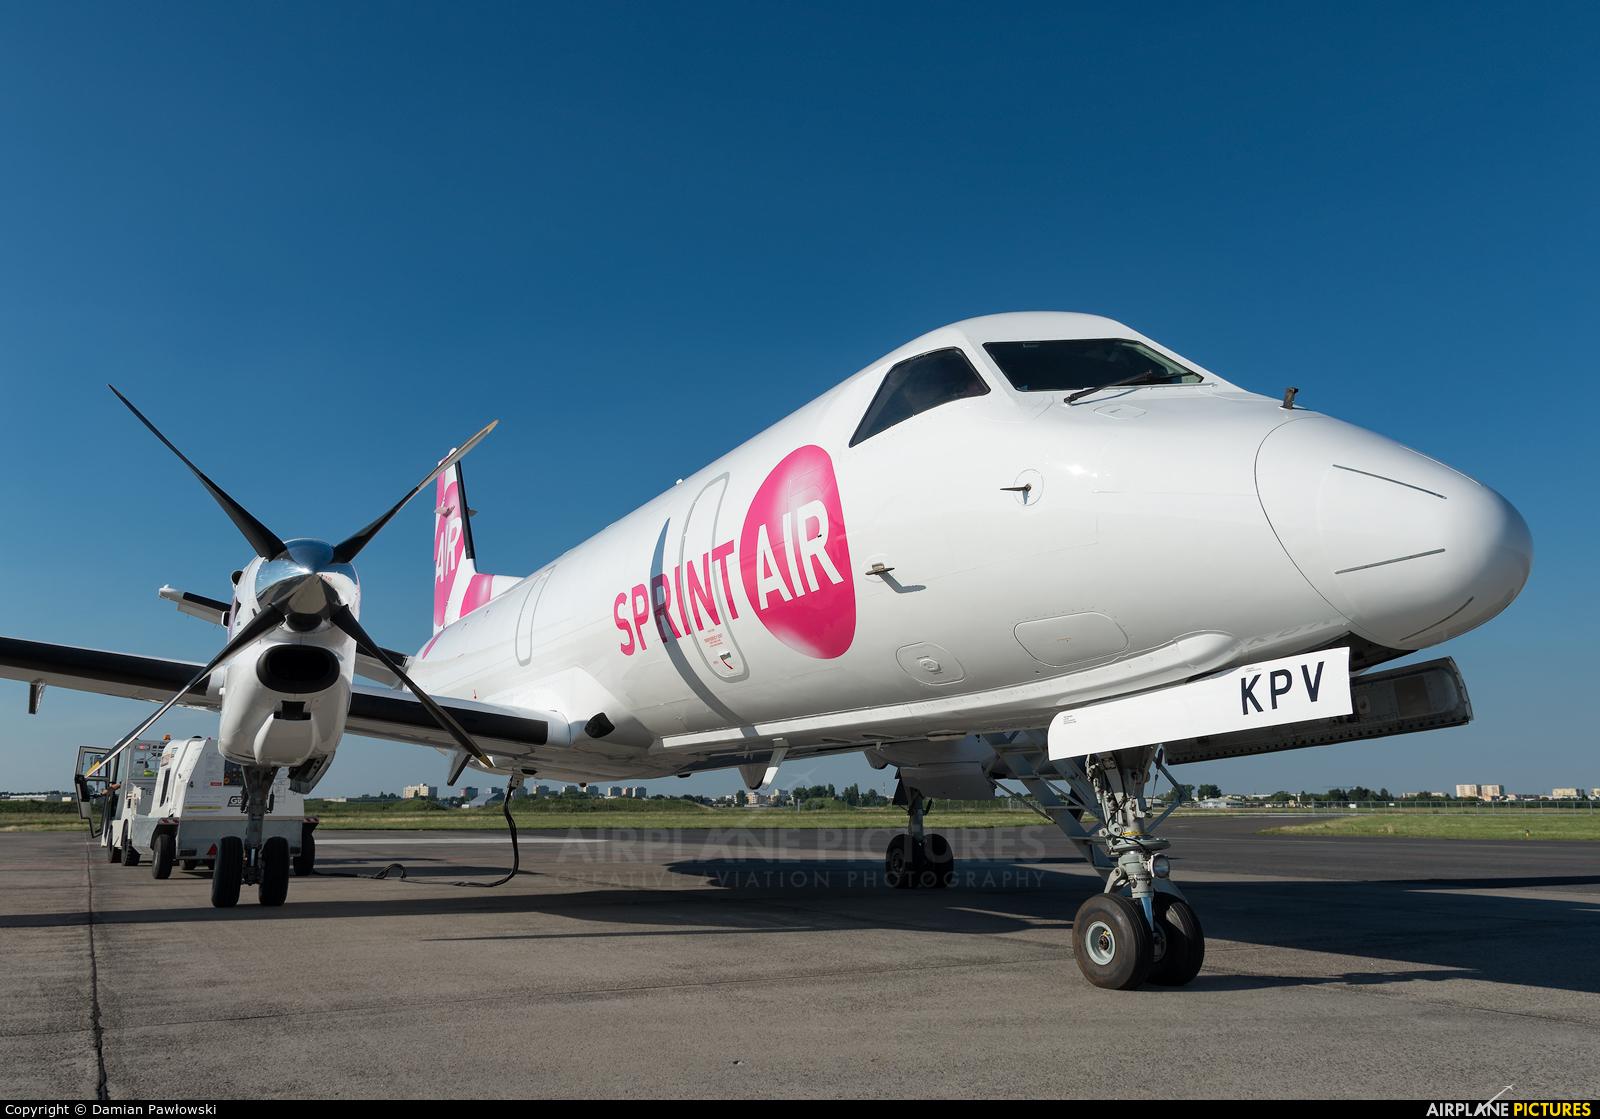 Sprint Air SP-KPV aircraft at Bydgoszcz - Szwederowo